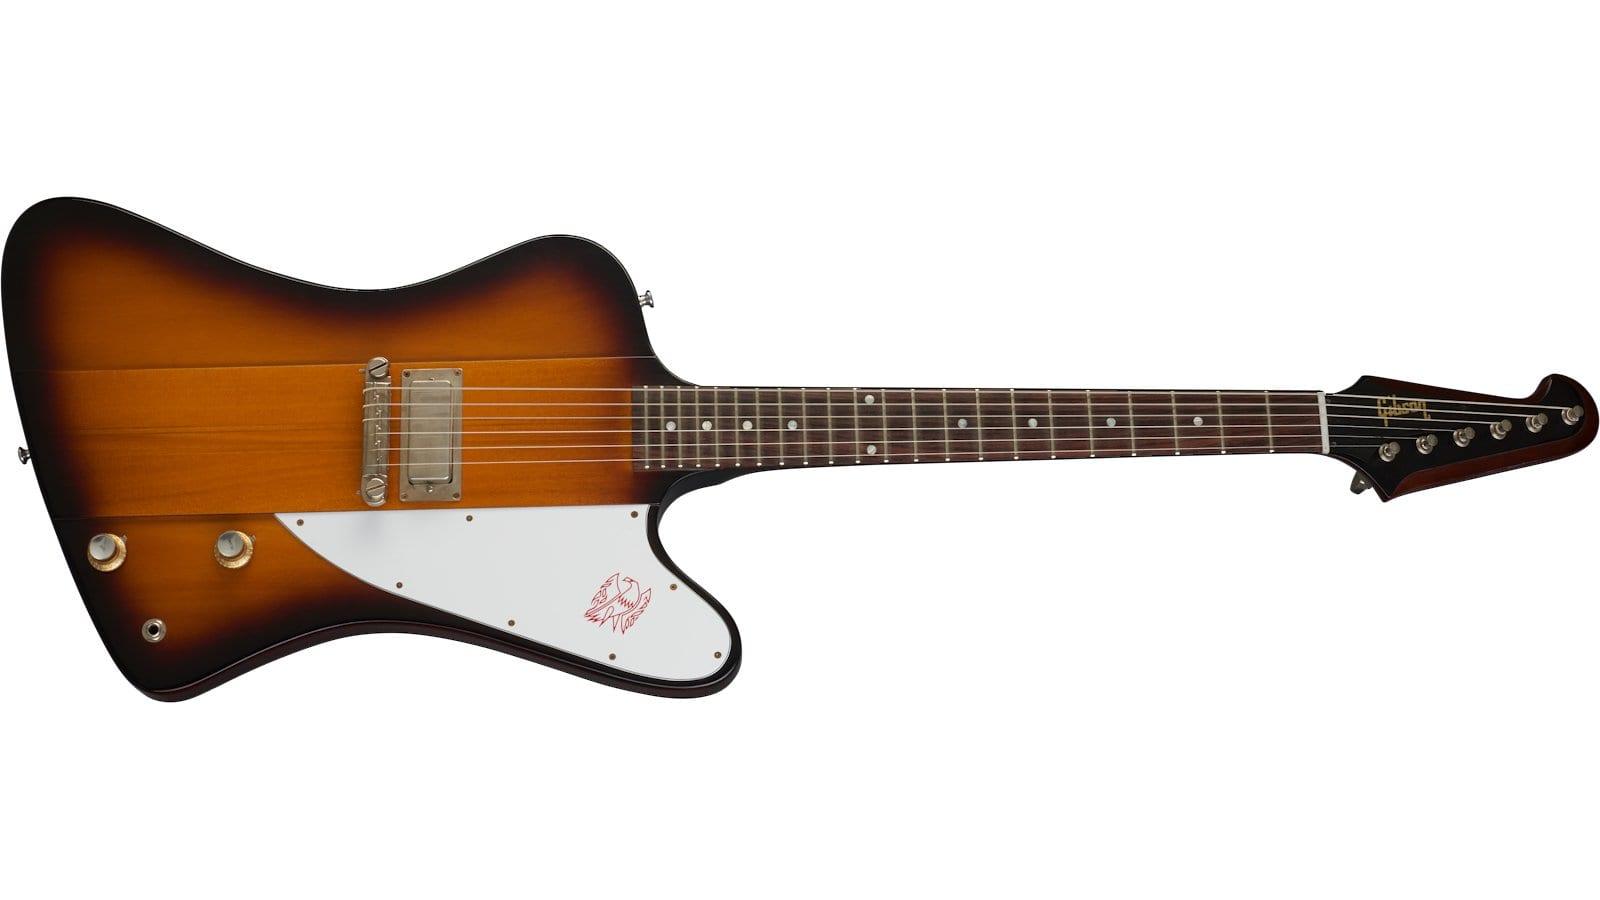 Eric Clapton Firebird 1 with Lightning Bar